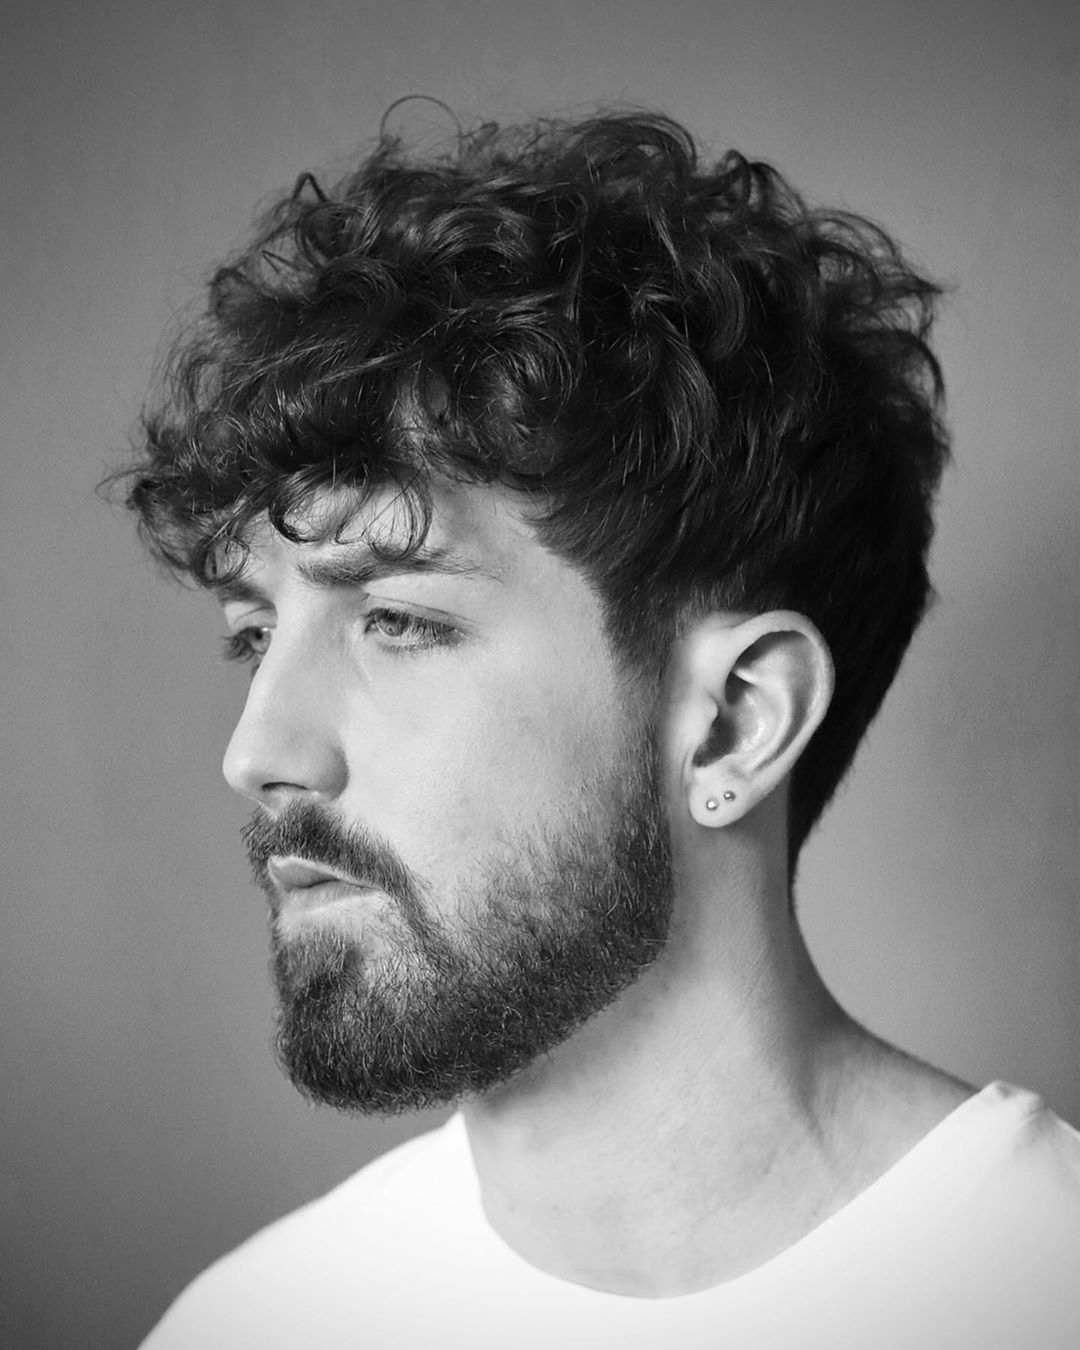 Beard Styles For Men With Curly Hair Wavy Hair Men Mens Hairstyles Thick Hair Curly Hair Men